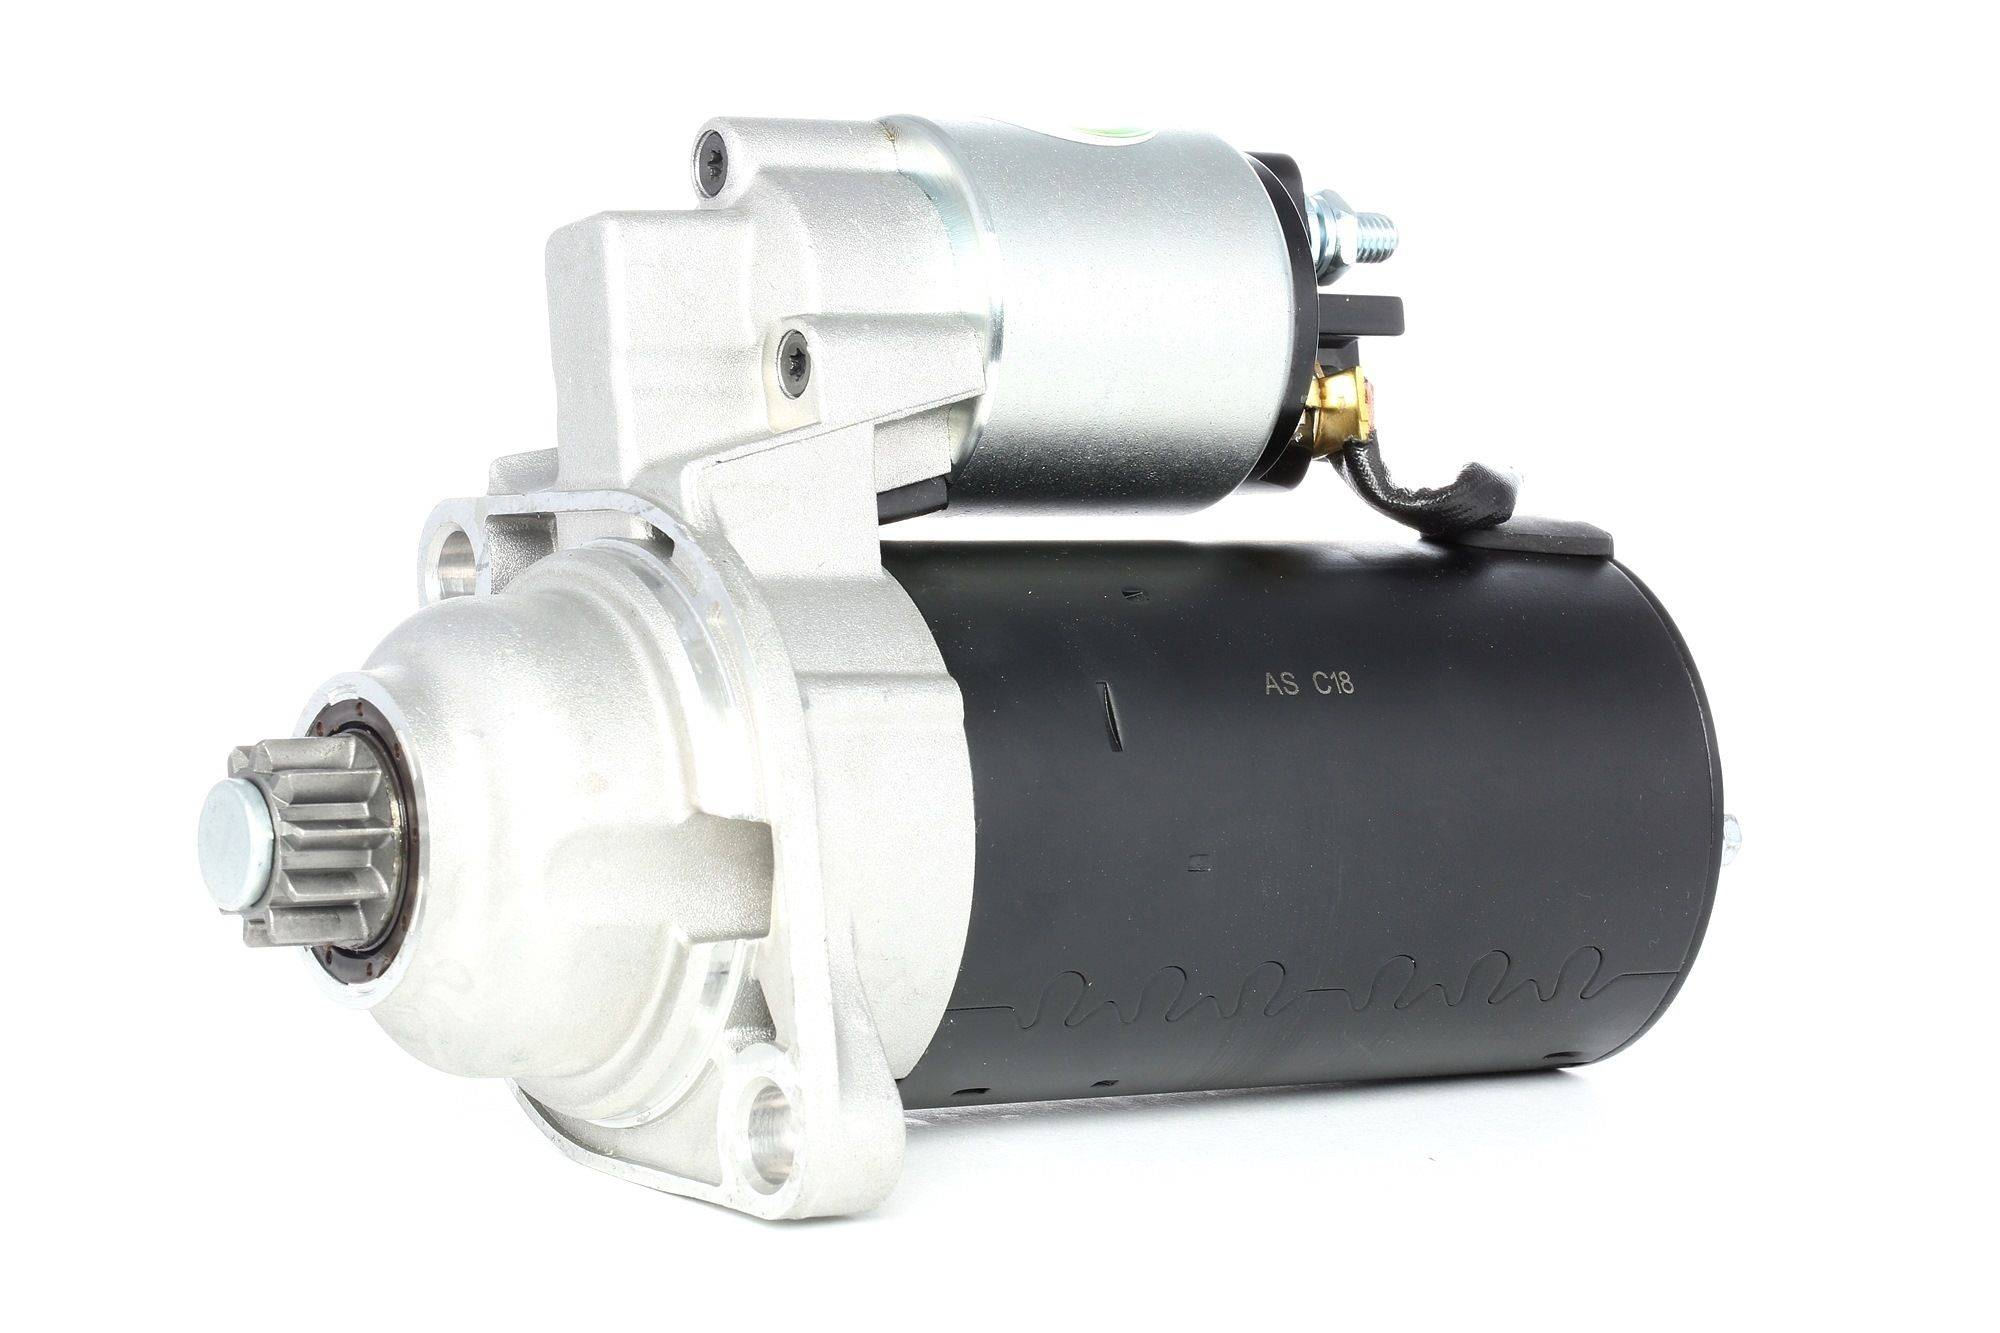 AS-PL Starttimoottori Brand new AS-PL Alternator Cover for freewheel pulley S0025 Startti,Käynnistinmoottori VW,AUDI,FORD,GOLF IV 1J1,POLO 9N_